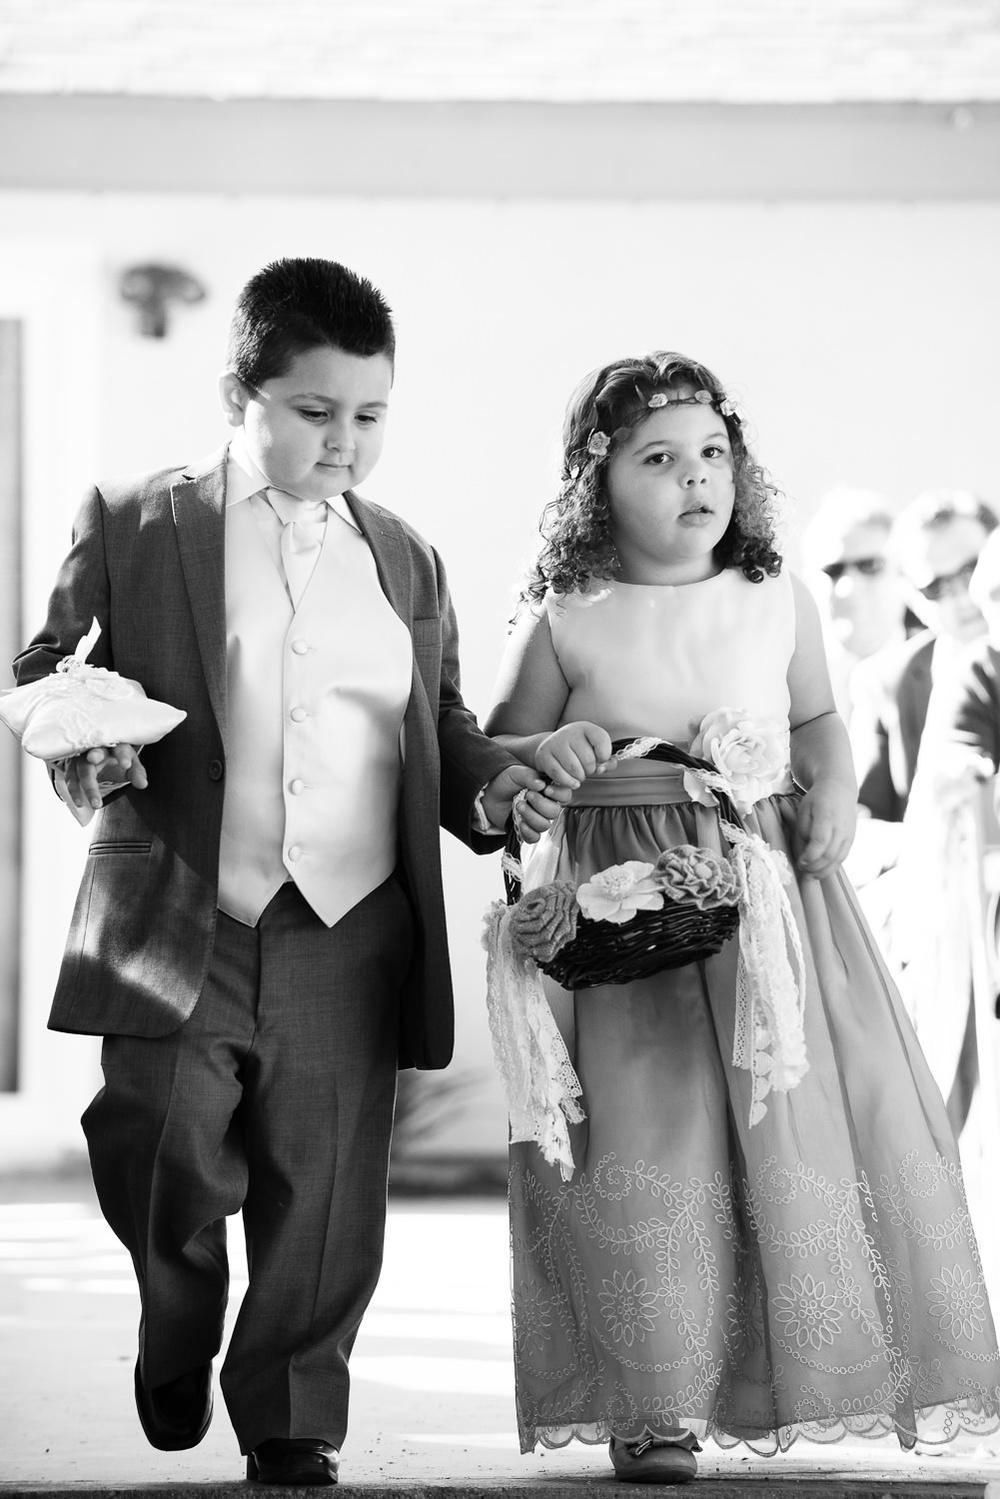 f27-Photography-Ojai-Wedding-February-2014-Flower-Girl-and-Ring-Bearer-Walking-Down-Aisle